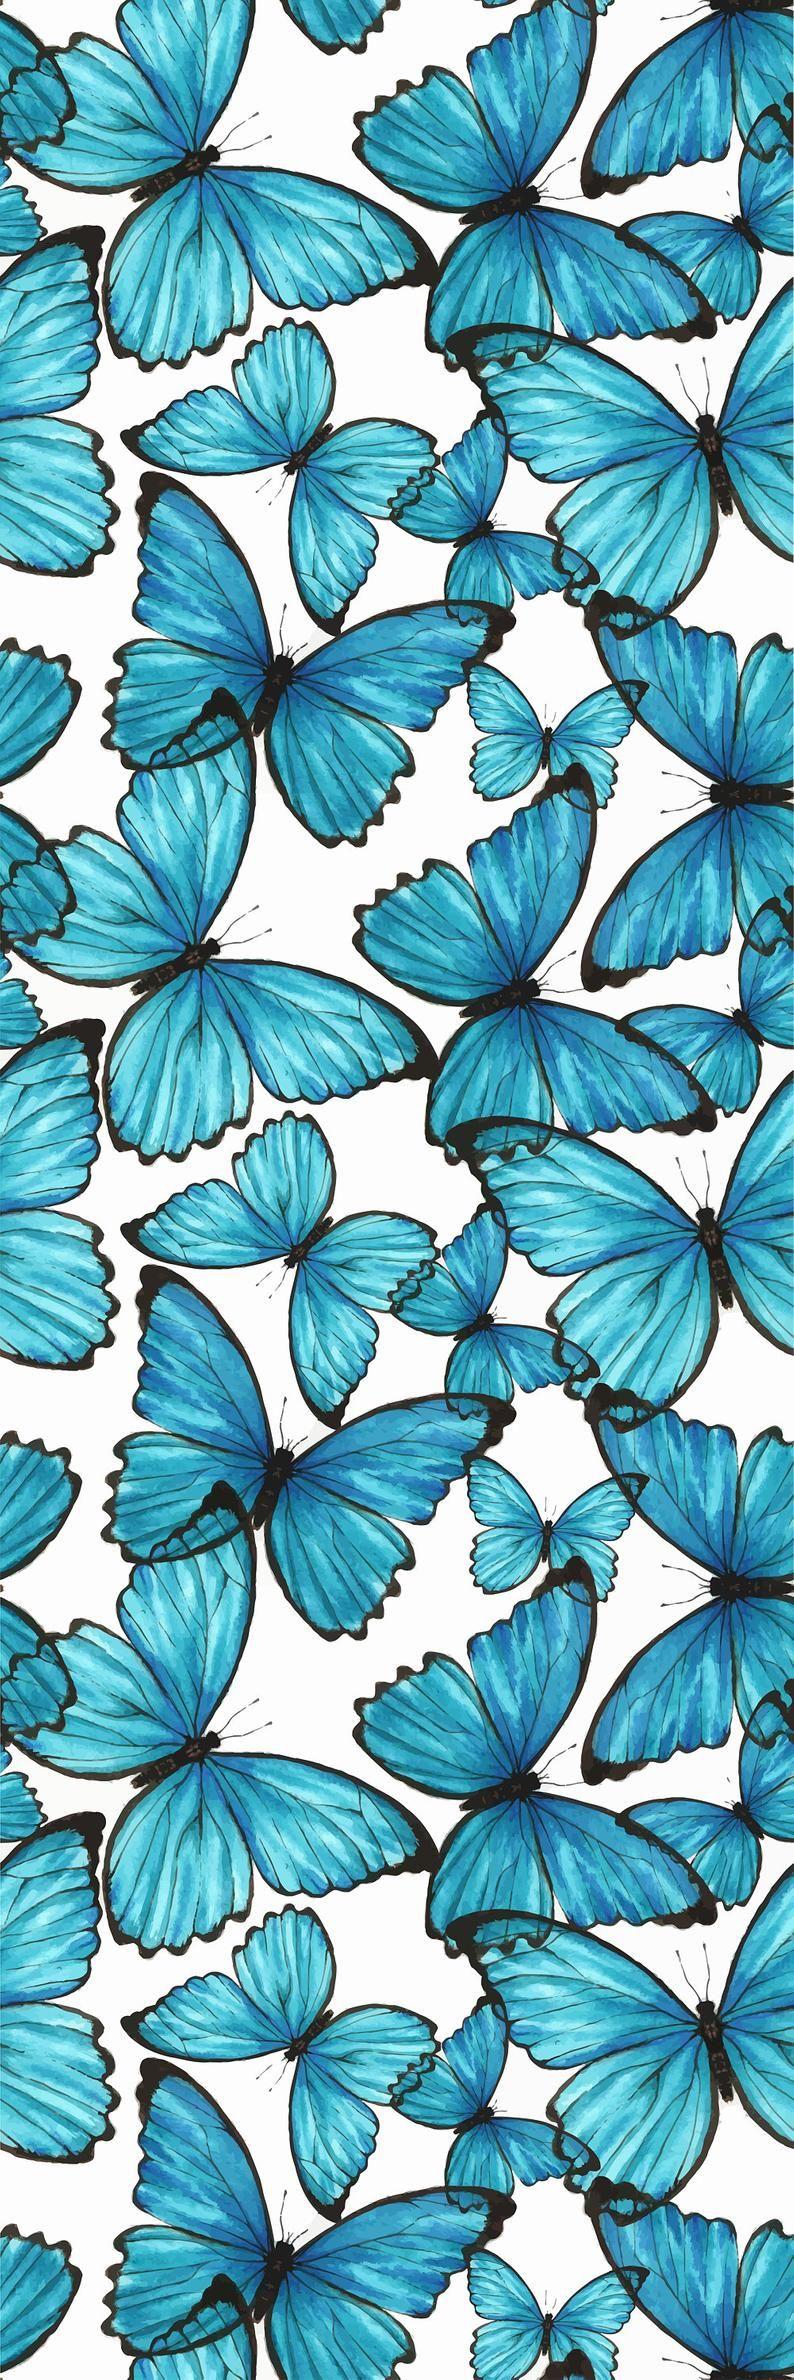 Removable Wallpaper Self Adhesive Blue Butterflies Nursery Wallpaper Peel & Stick Wallpaper #backrounds